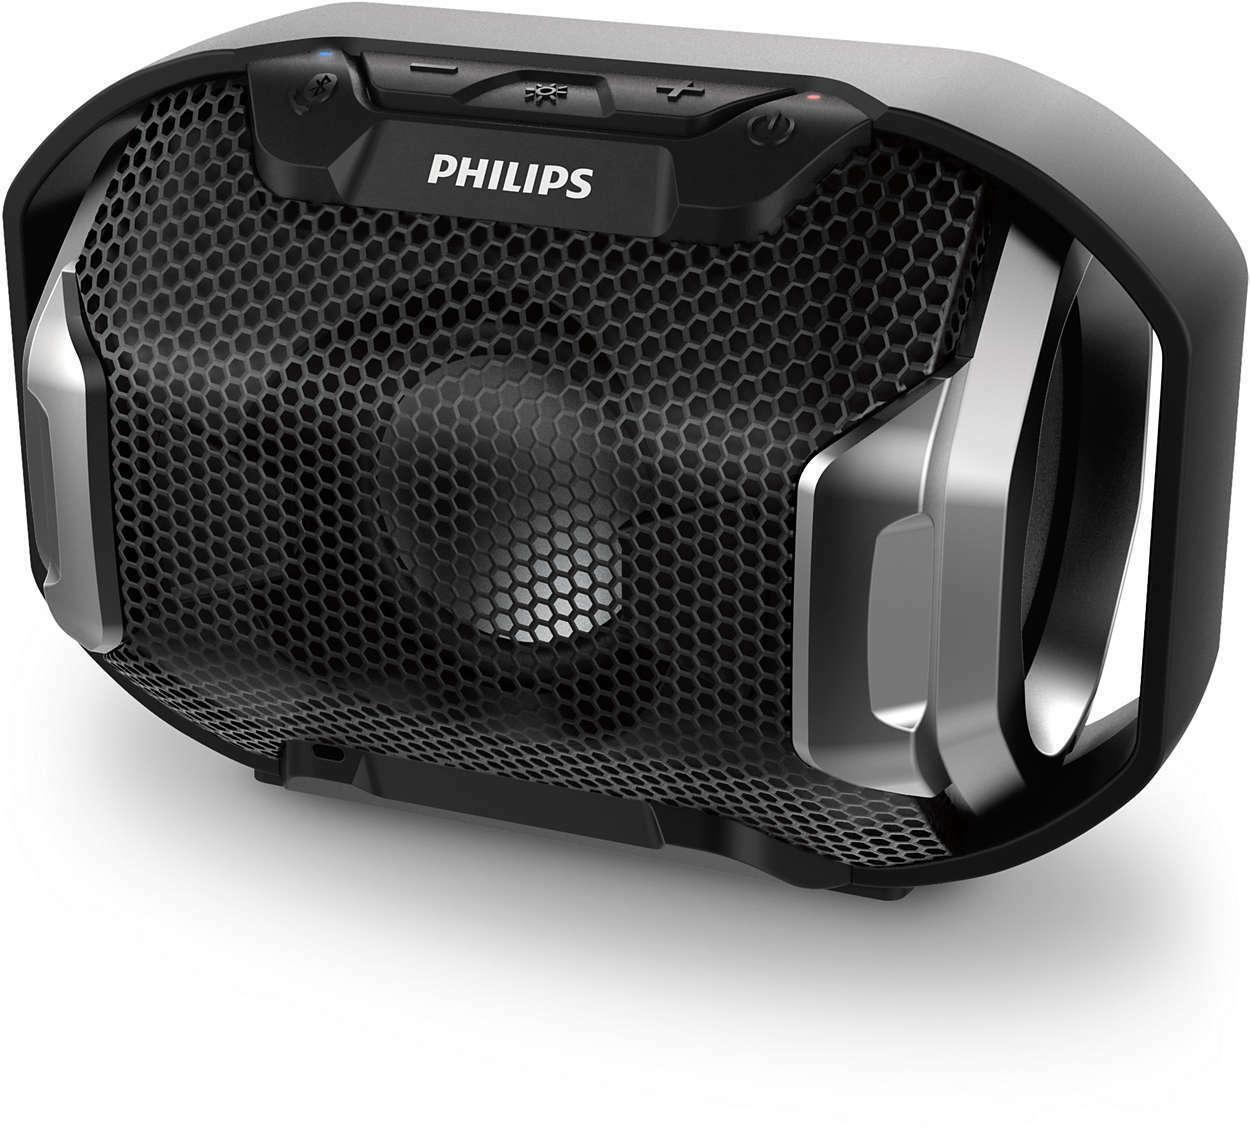 Philips ShoqBox SB300B Waterproof IPX7 Bluetooth Speaker w/